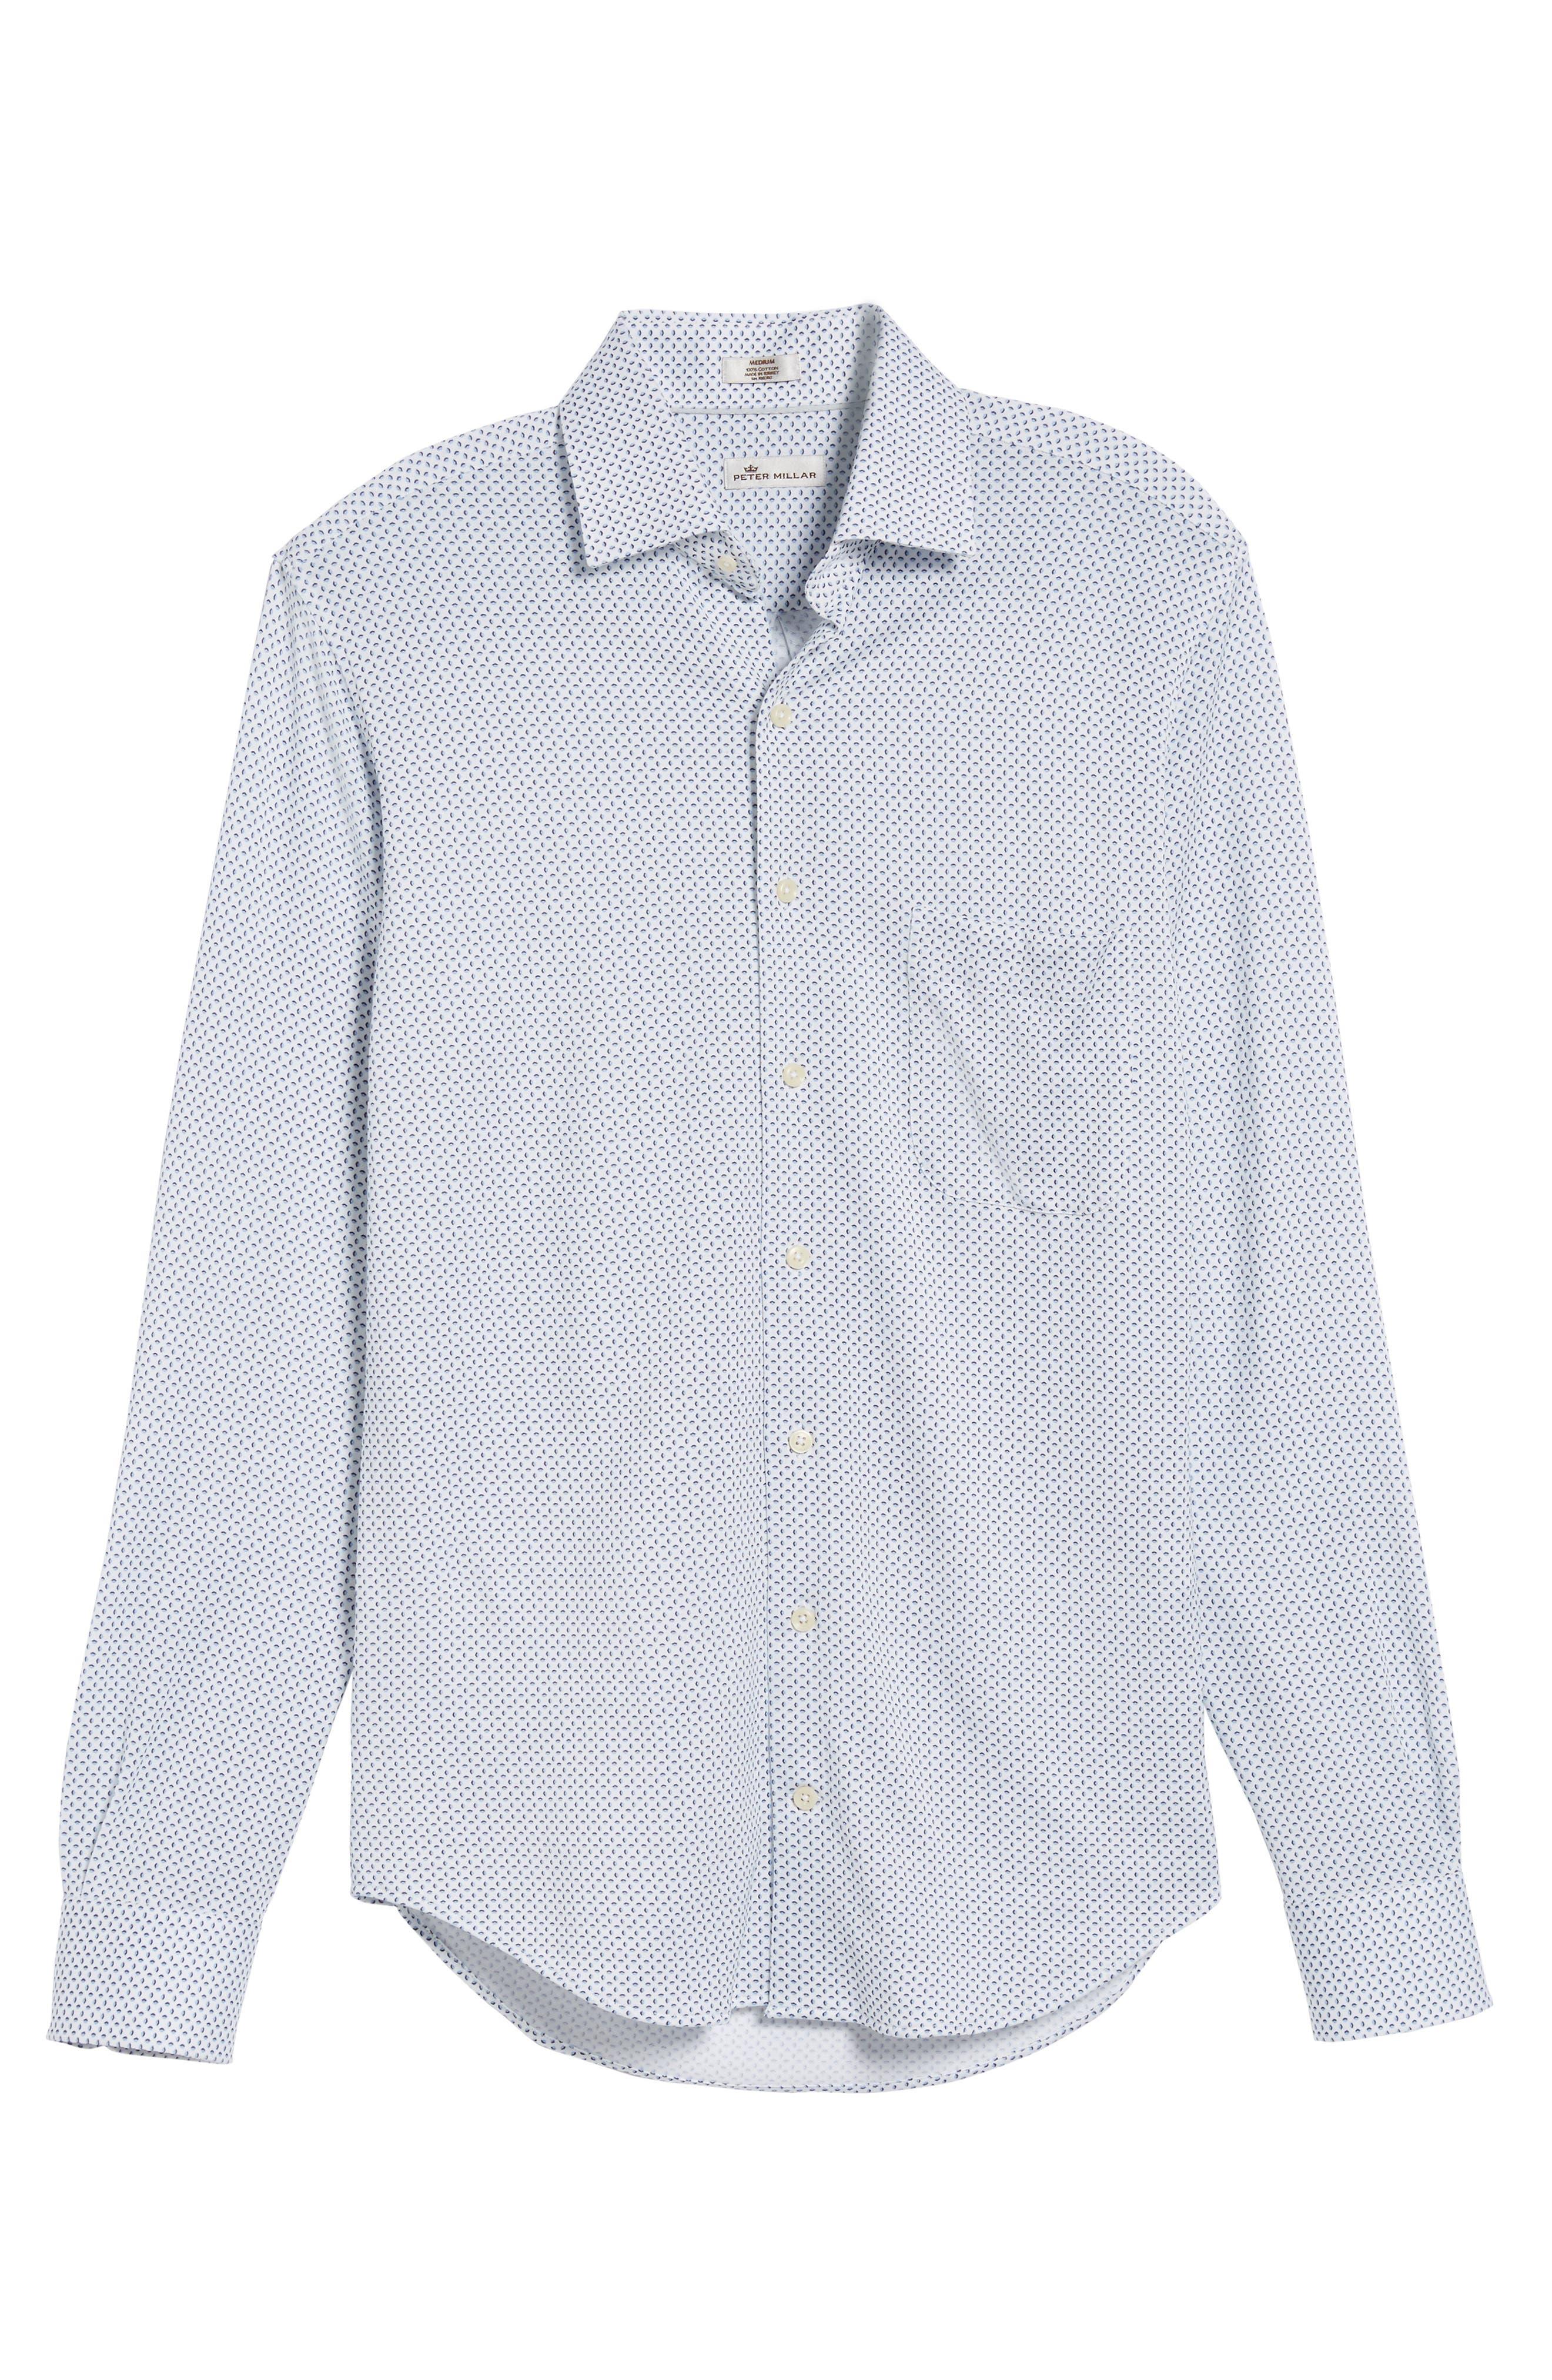 Ocean Mist Classic Fit Print Sport Shirt,                             Alternate thumbnail 6, color,                             100